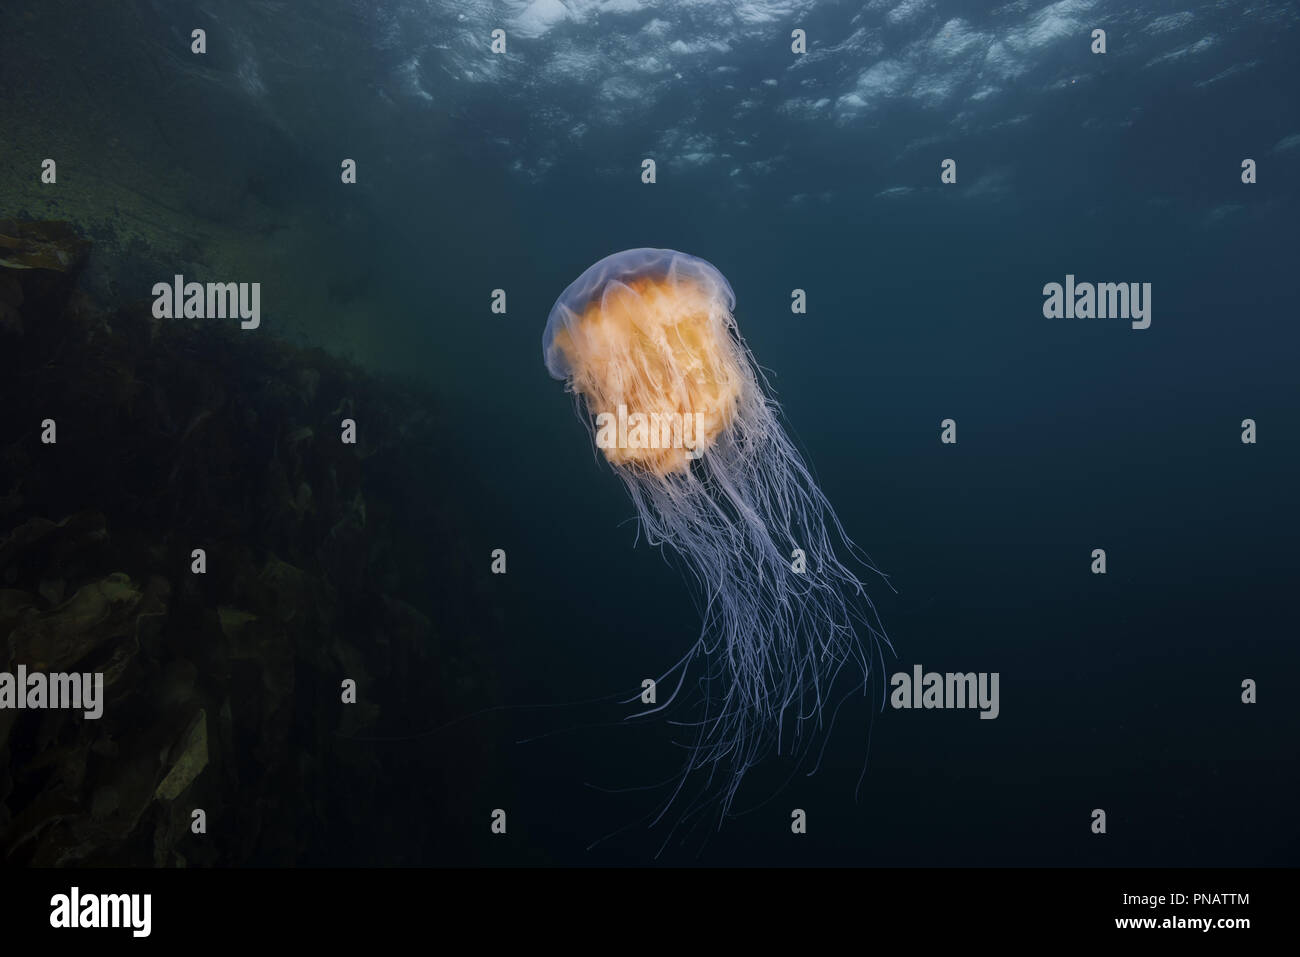 Lion's mane jellyfish (Cyanea capillata, Cyanea arctica) in the blue water near reef - Stock Image